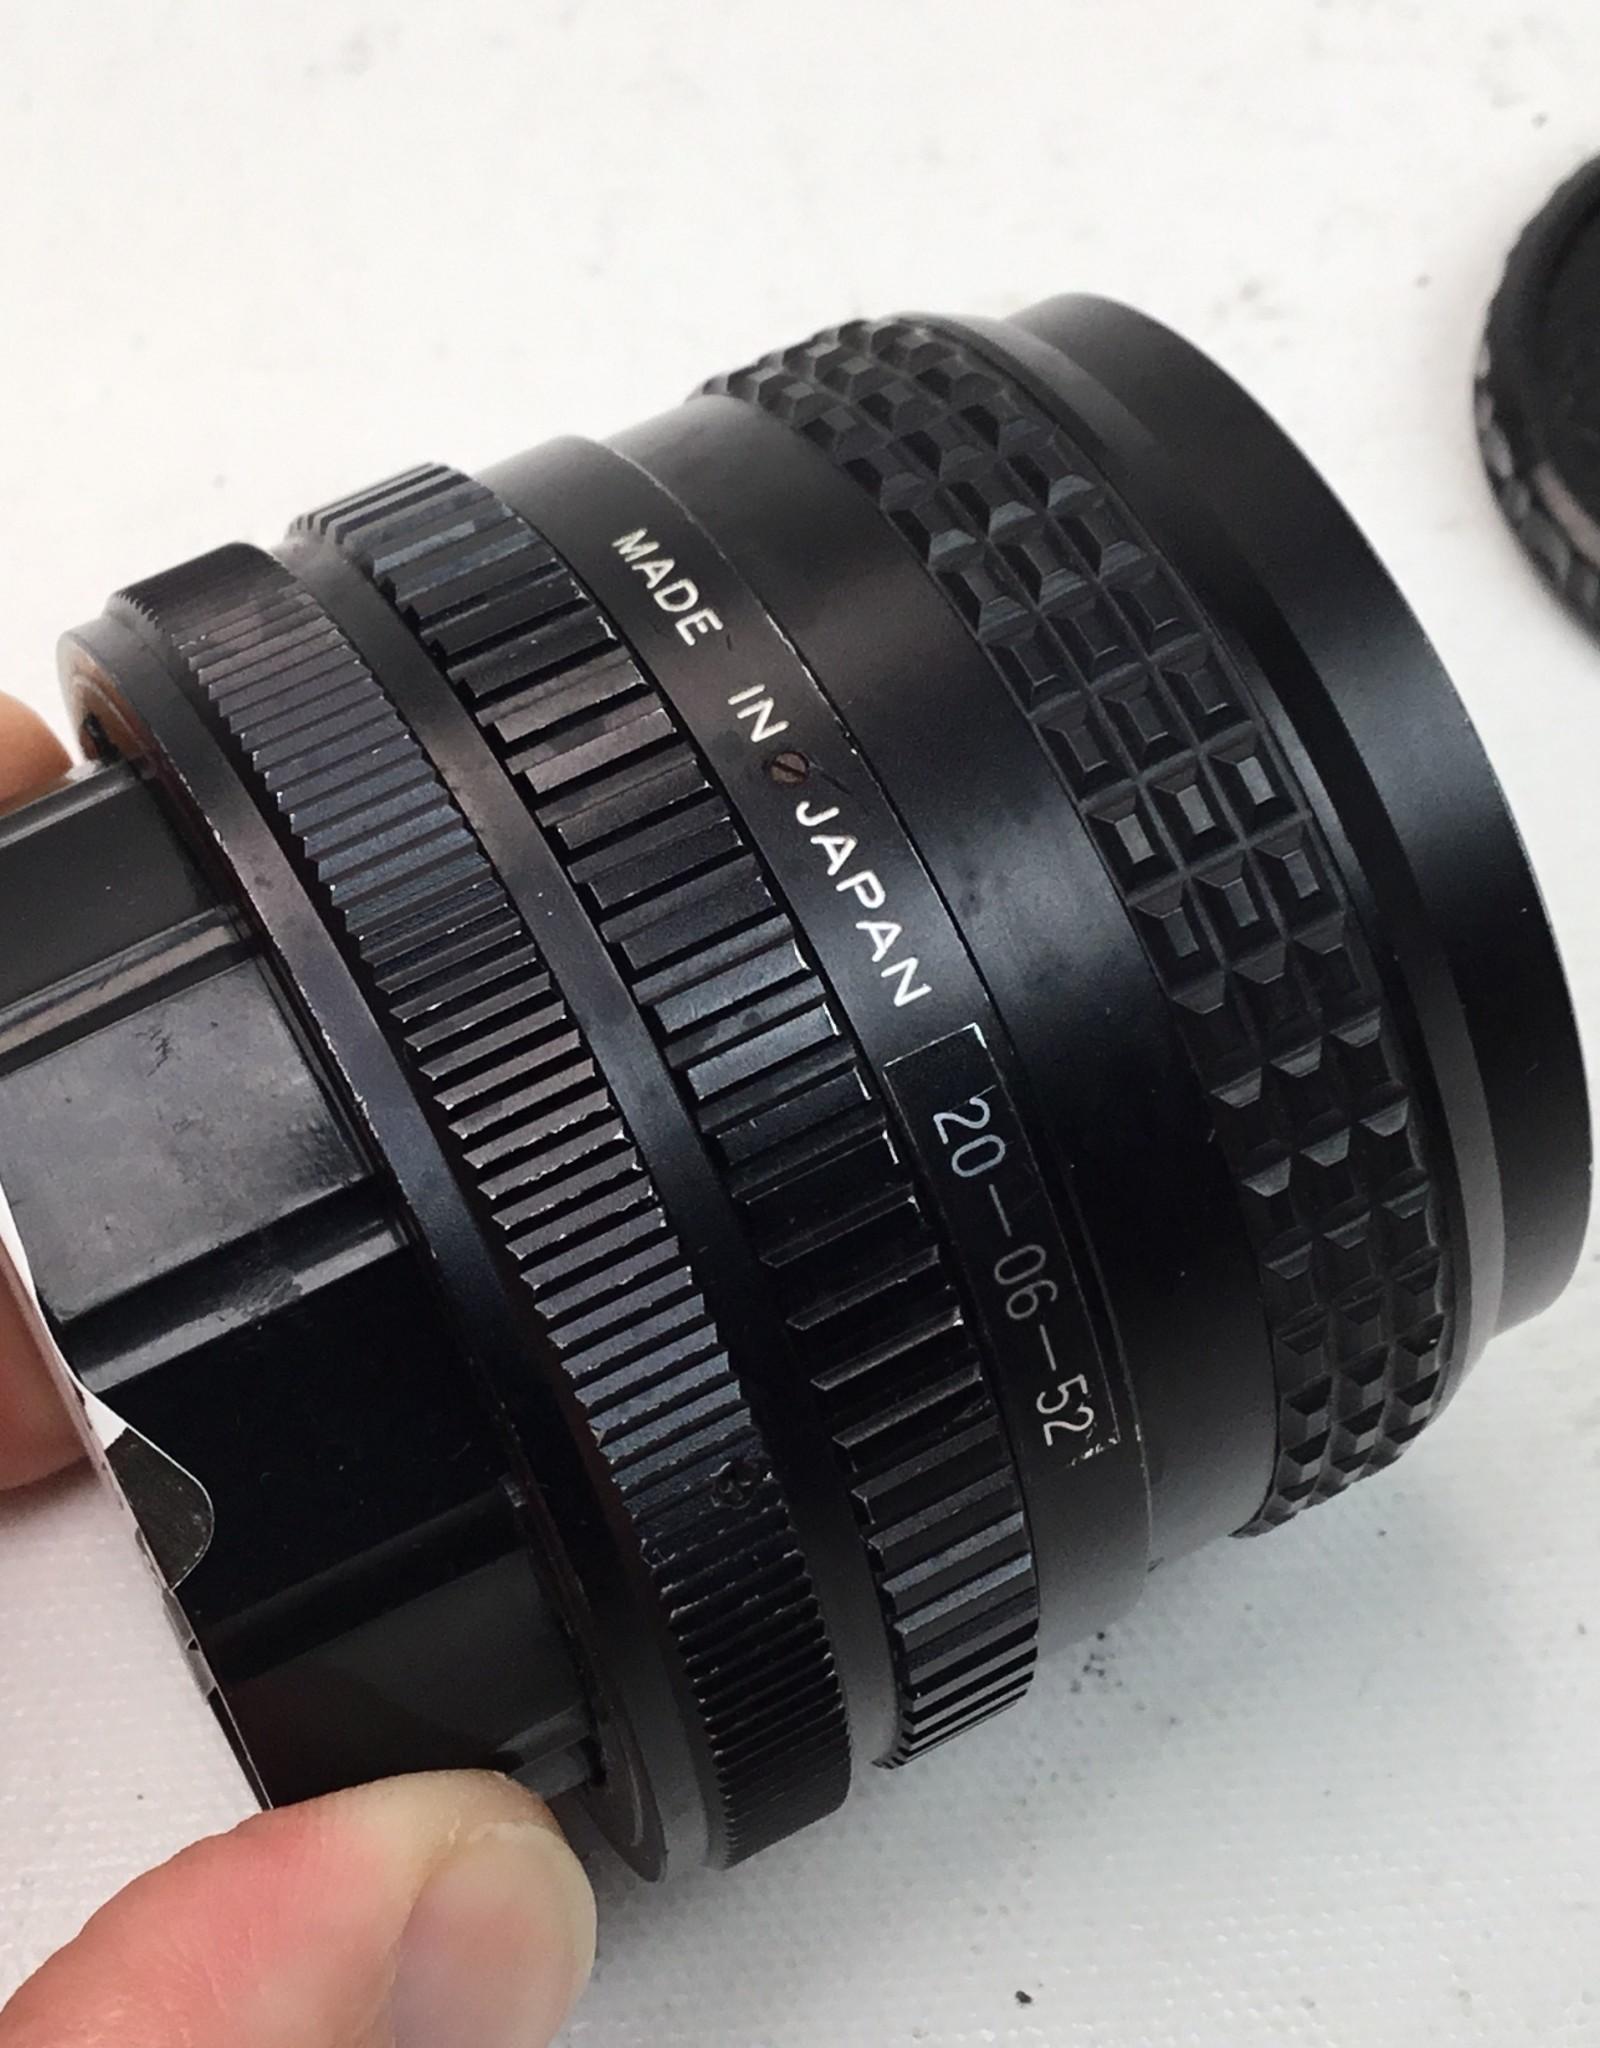 Focal 28mm f2.8 Lens for Canon FD Used Fair